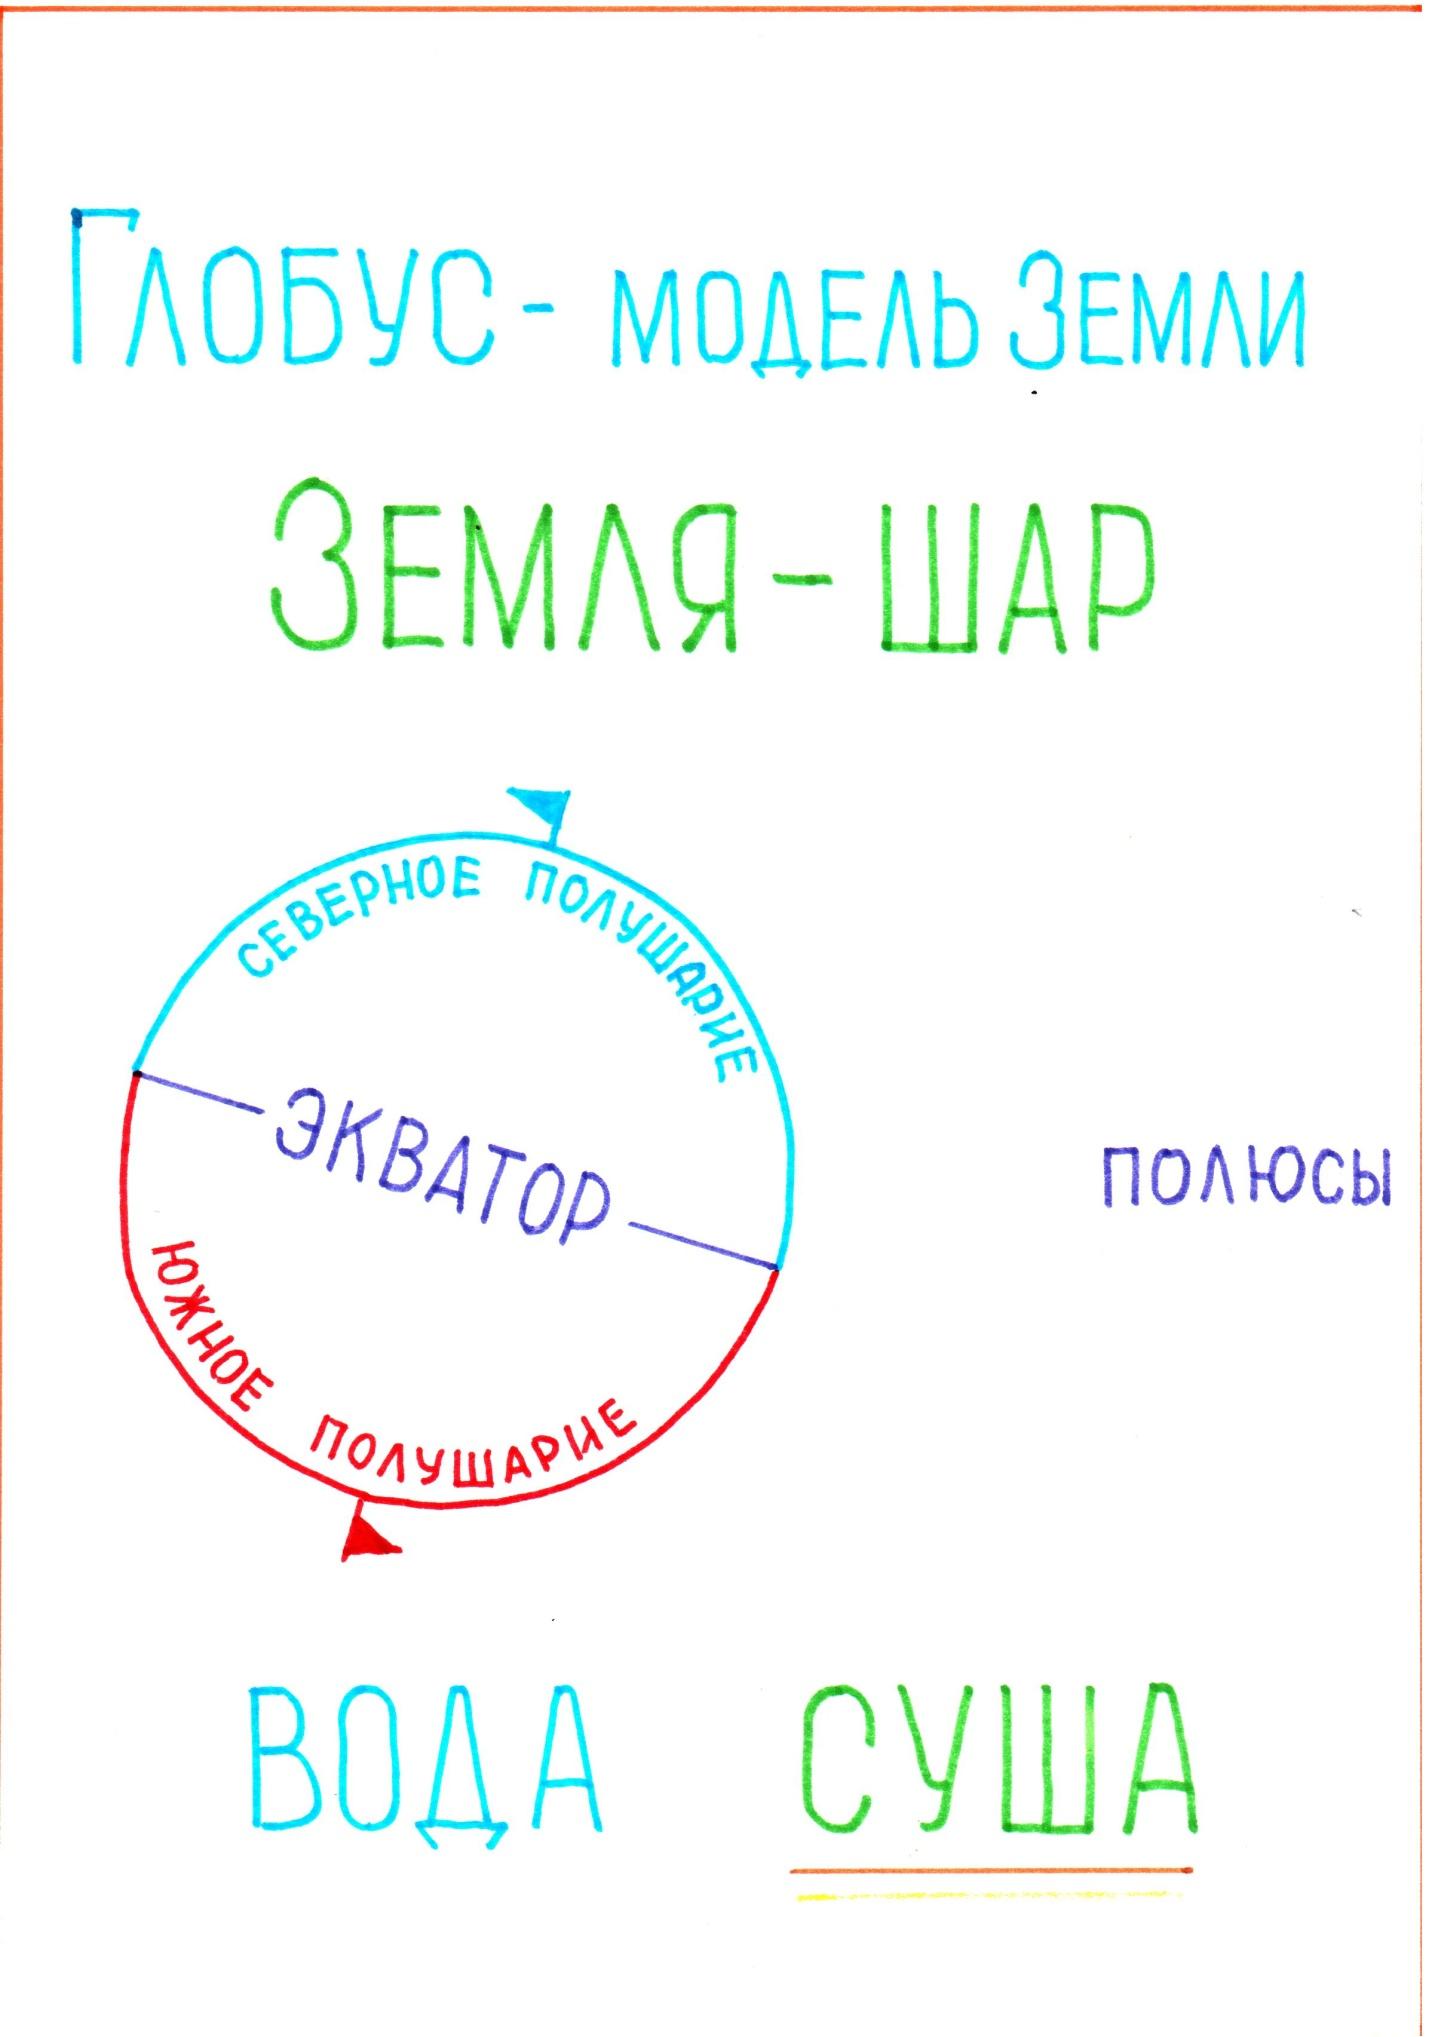 hello_html_mc117a5c.jpg